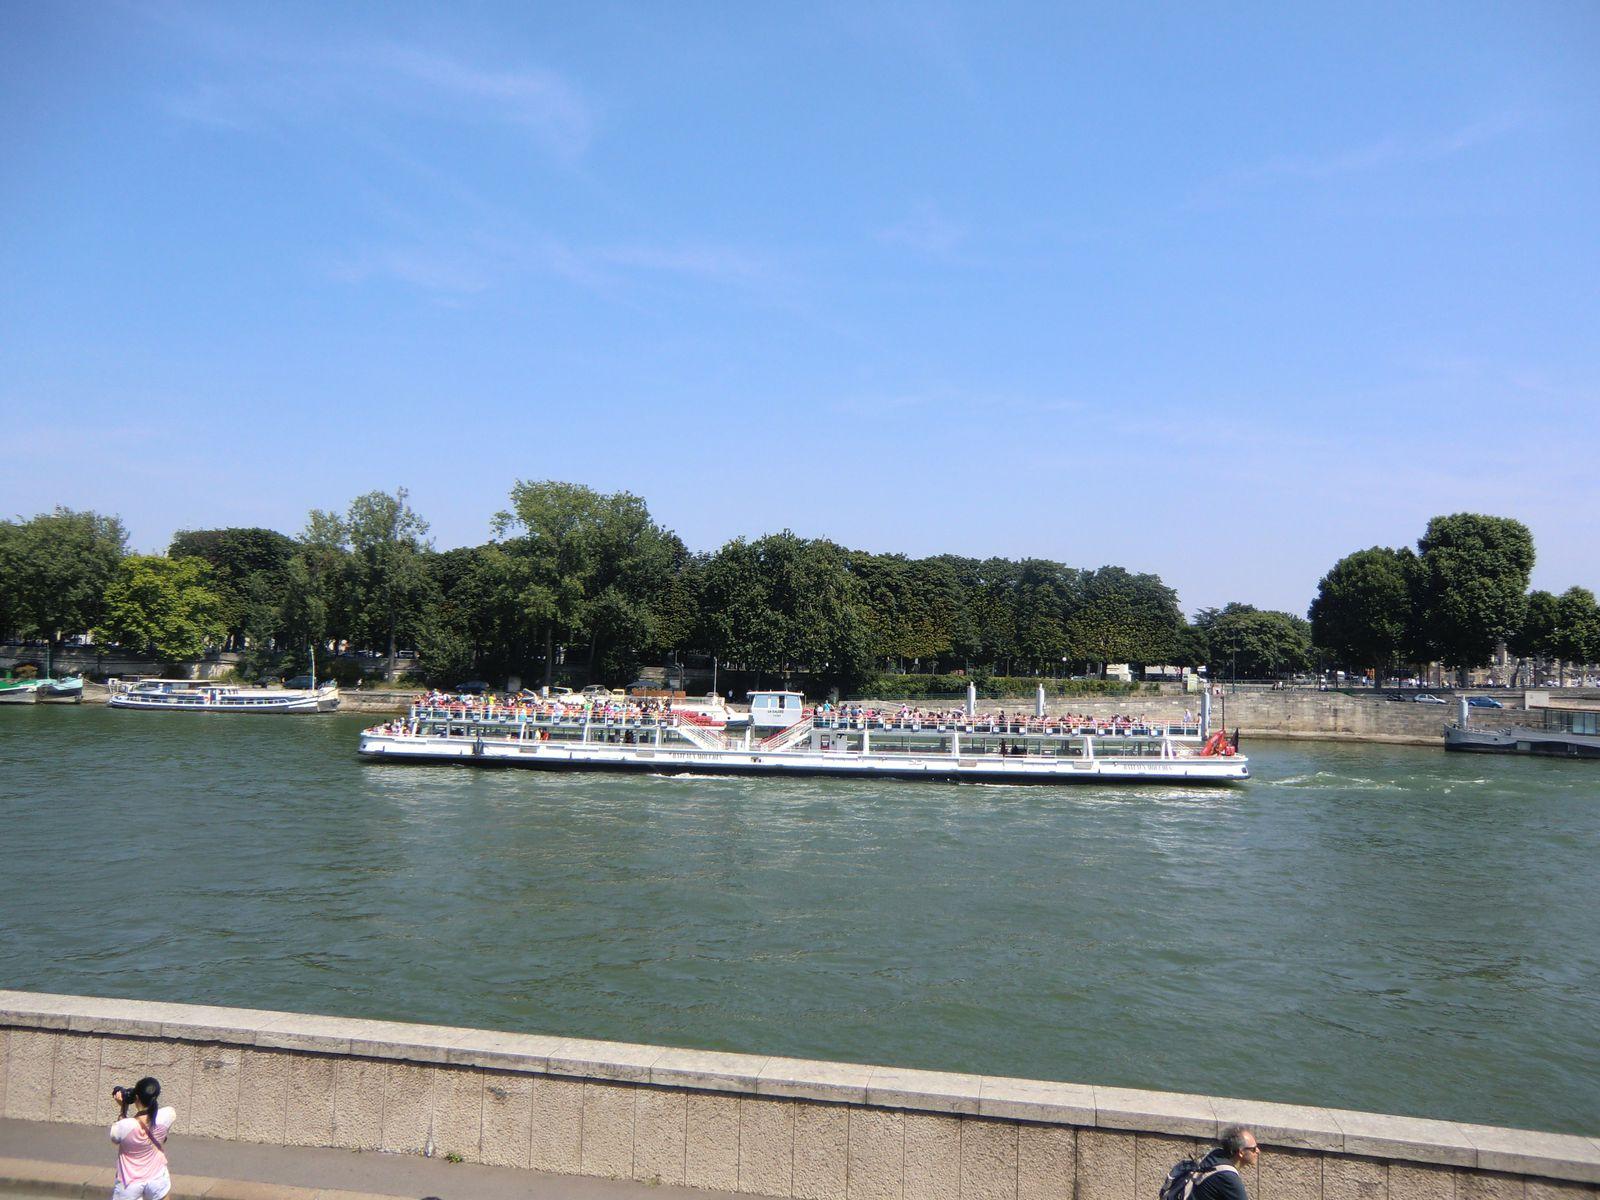 Vedette sur la Seine